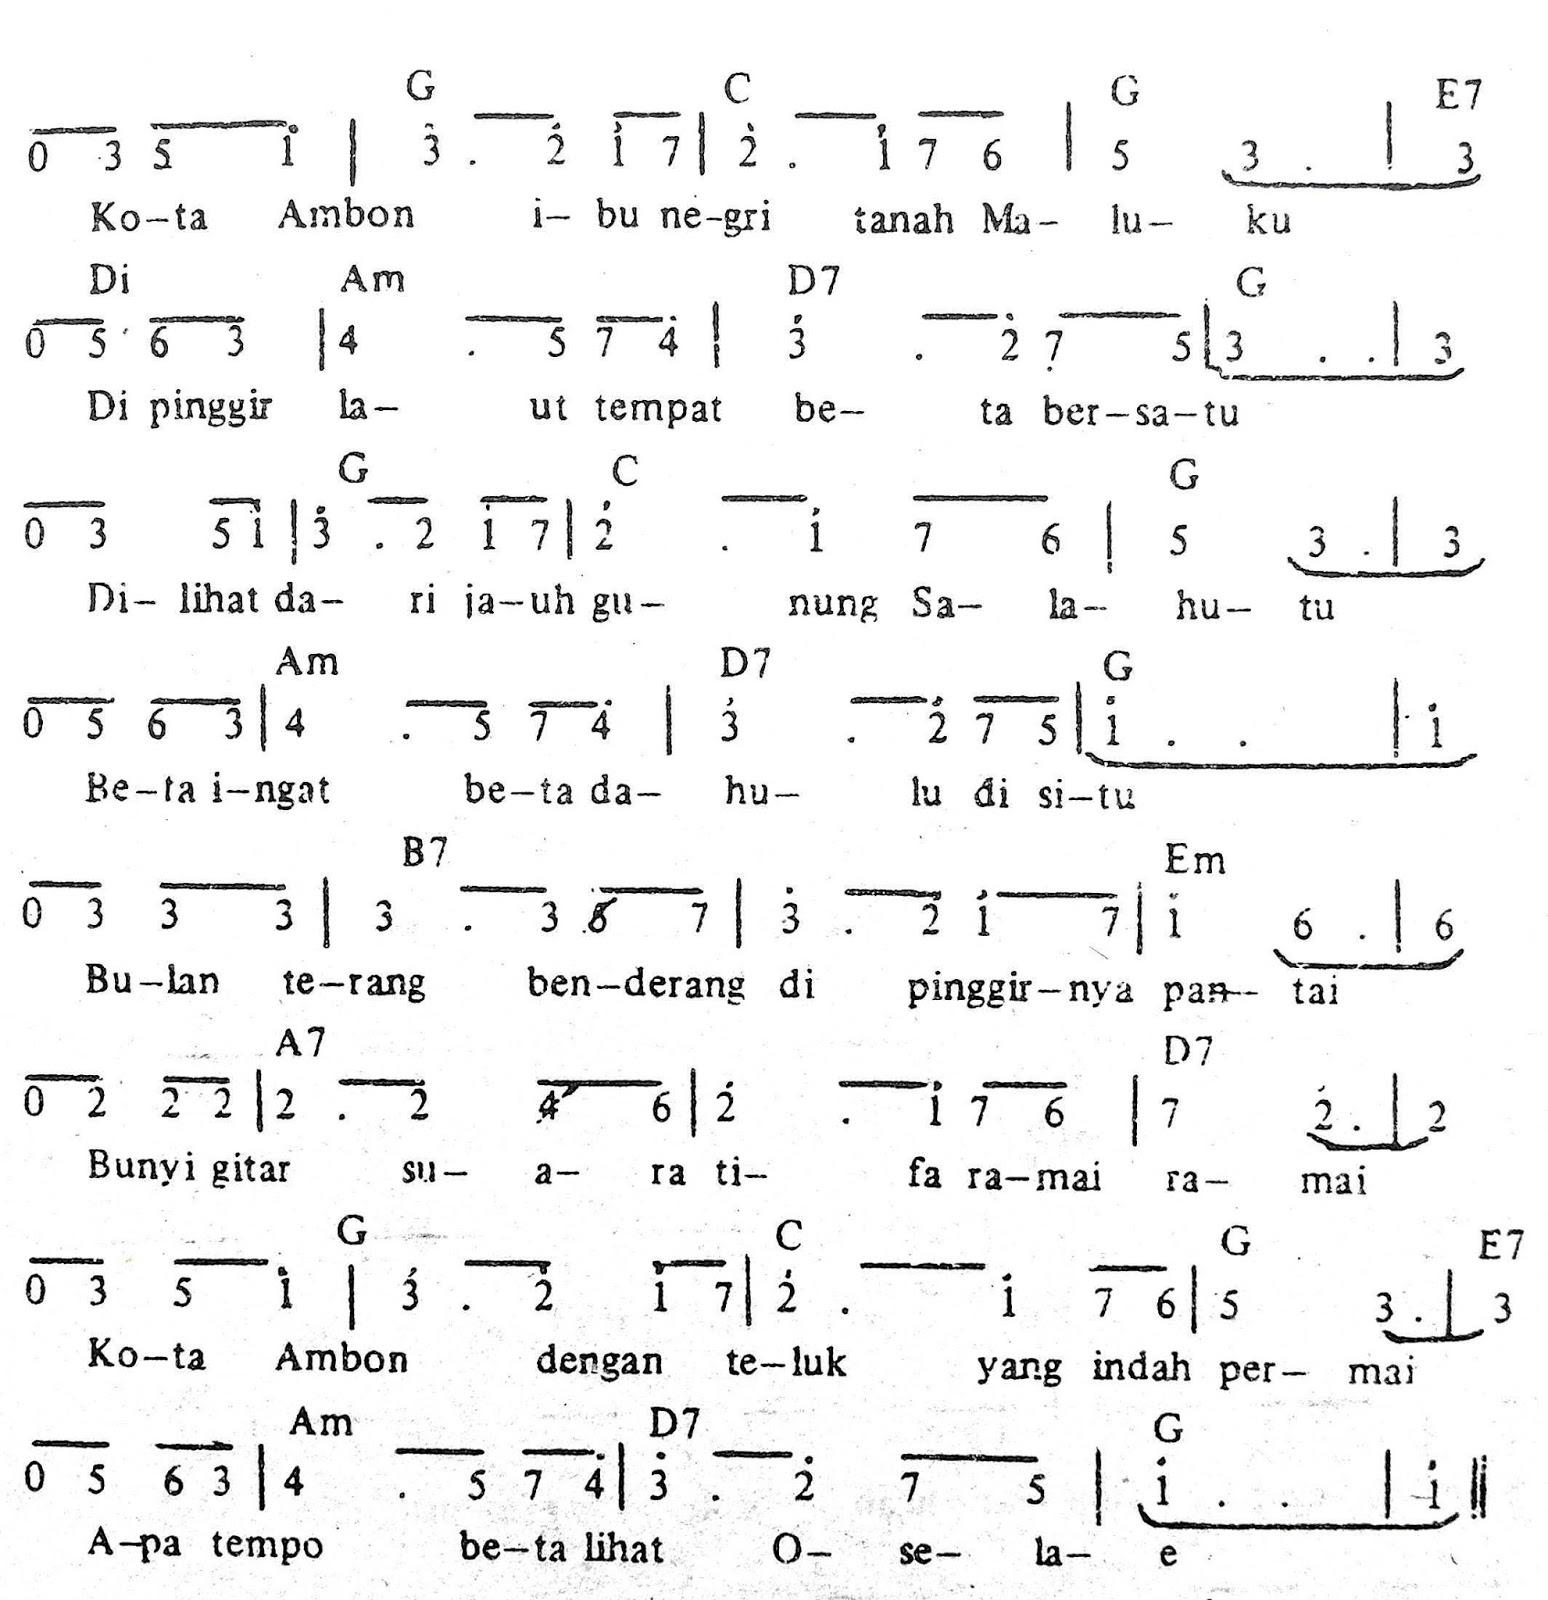 Chord & Arti Lirik Lagu Maluku: Naik Naik Ke Puncak Gunung + Not Angka